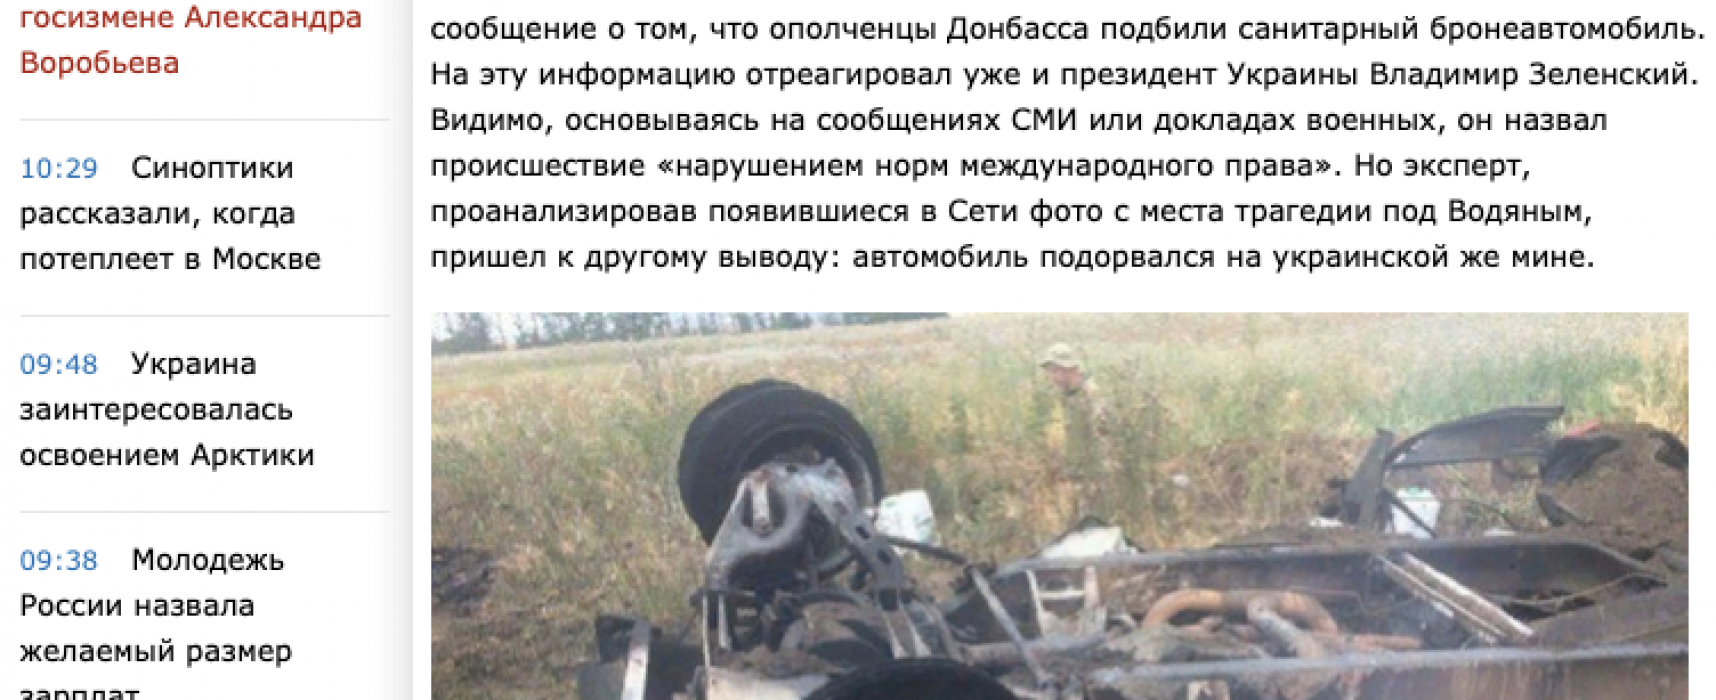 Falso: Los militares ucranianos engañaron al presidente ucraniano Zelensky